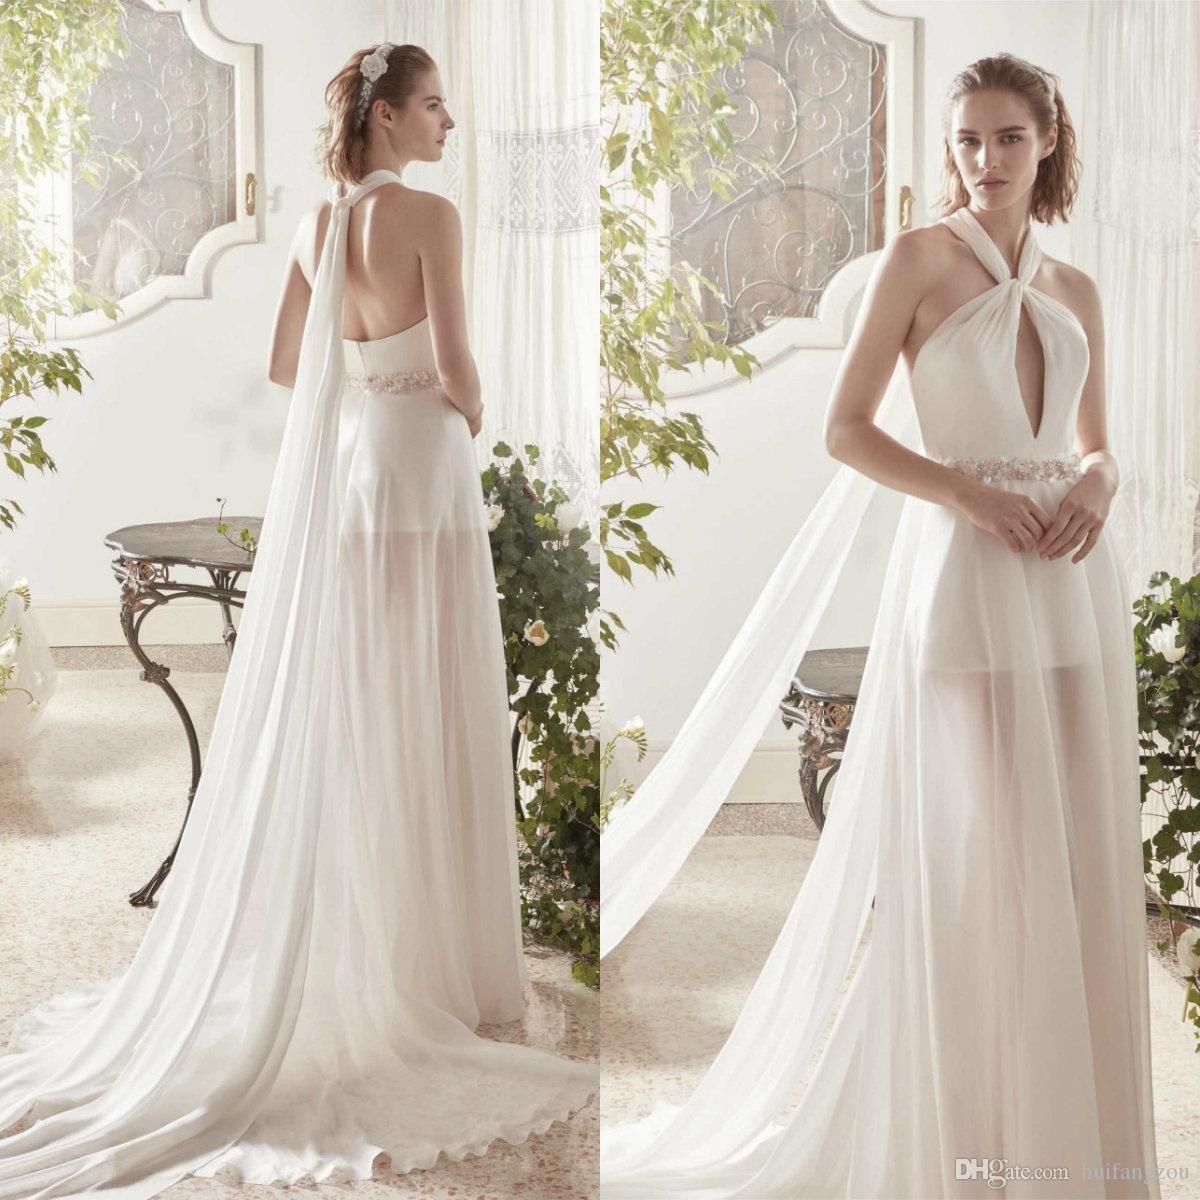 Vestidos novia verano 2019